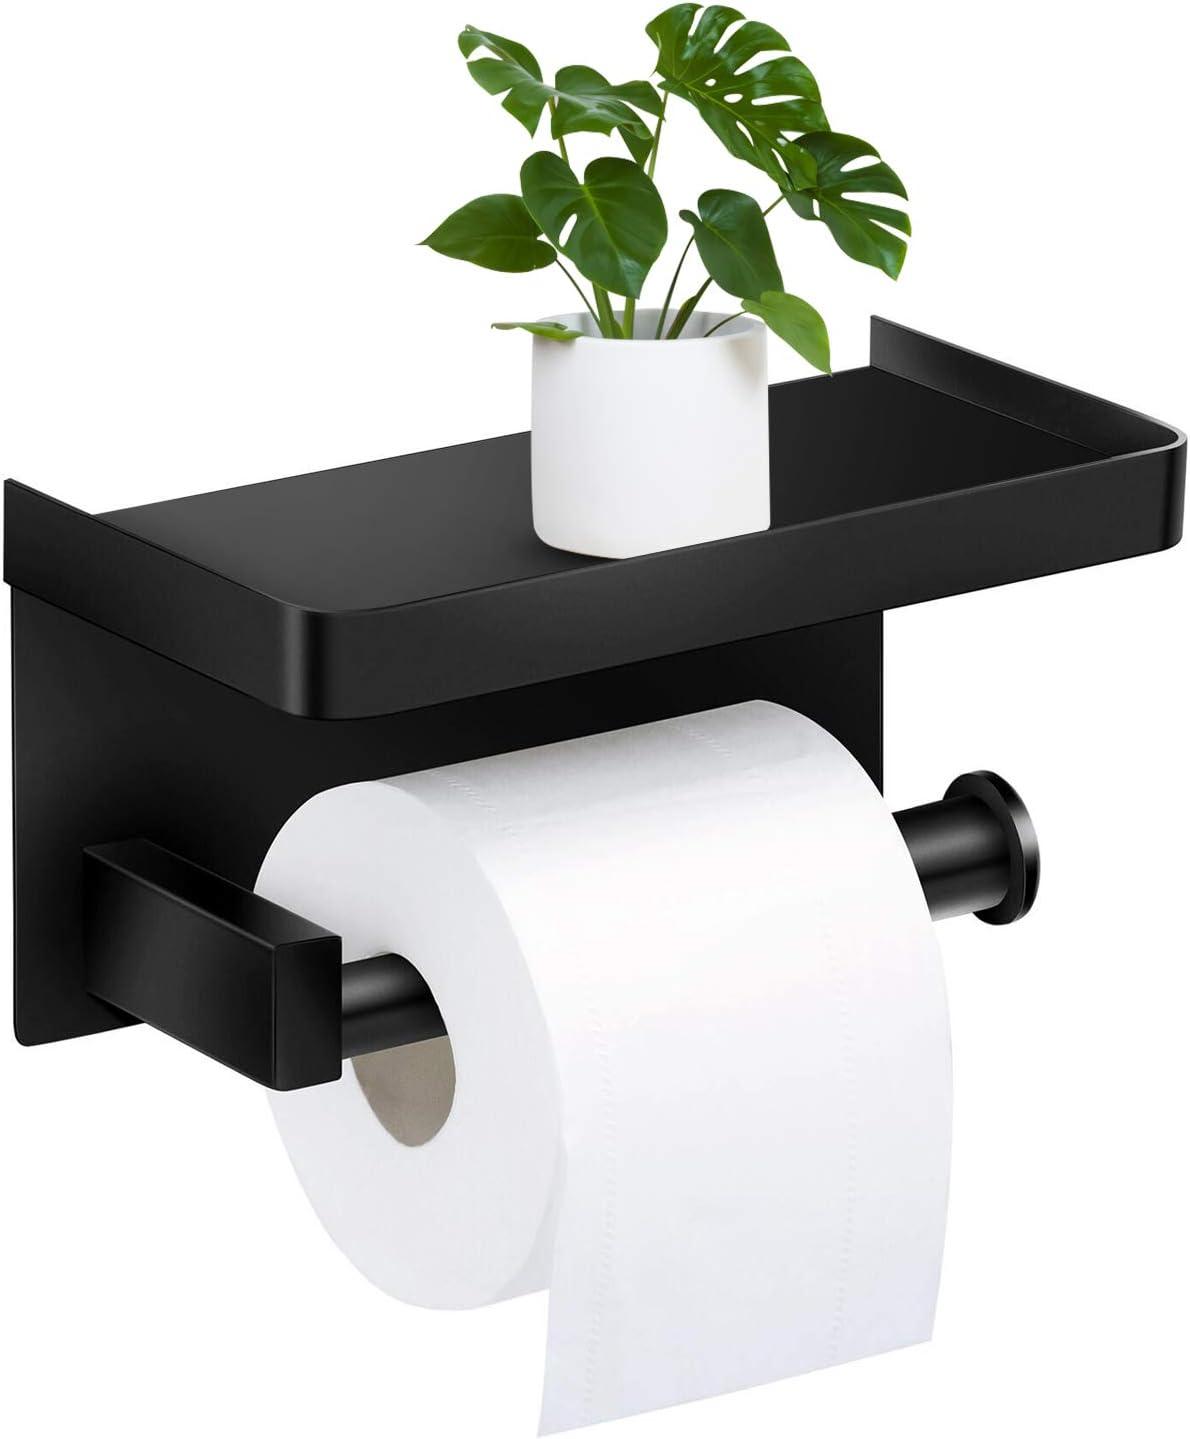 JUEJIDP Portarotolo in acciaio inox 304 porta carta igienica porta carta igienica vassoio carta igienica porta carta igienica Portasciugamani